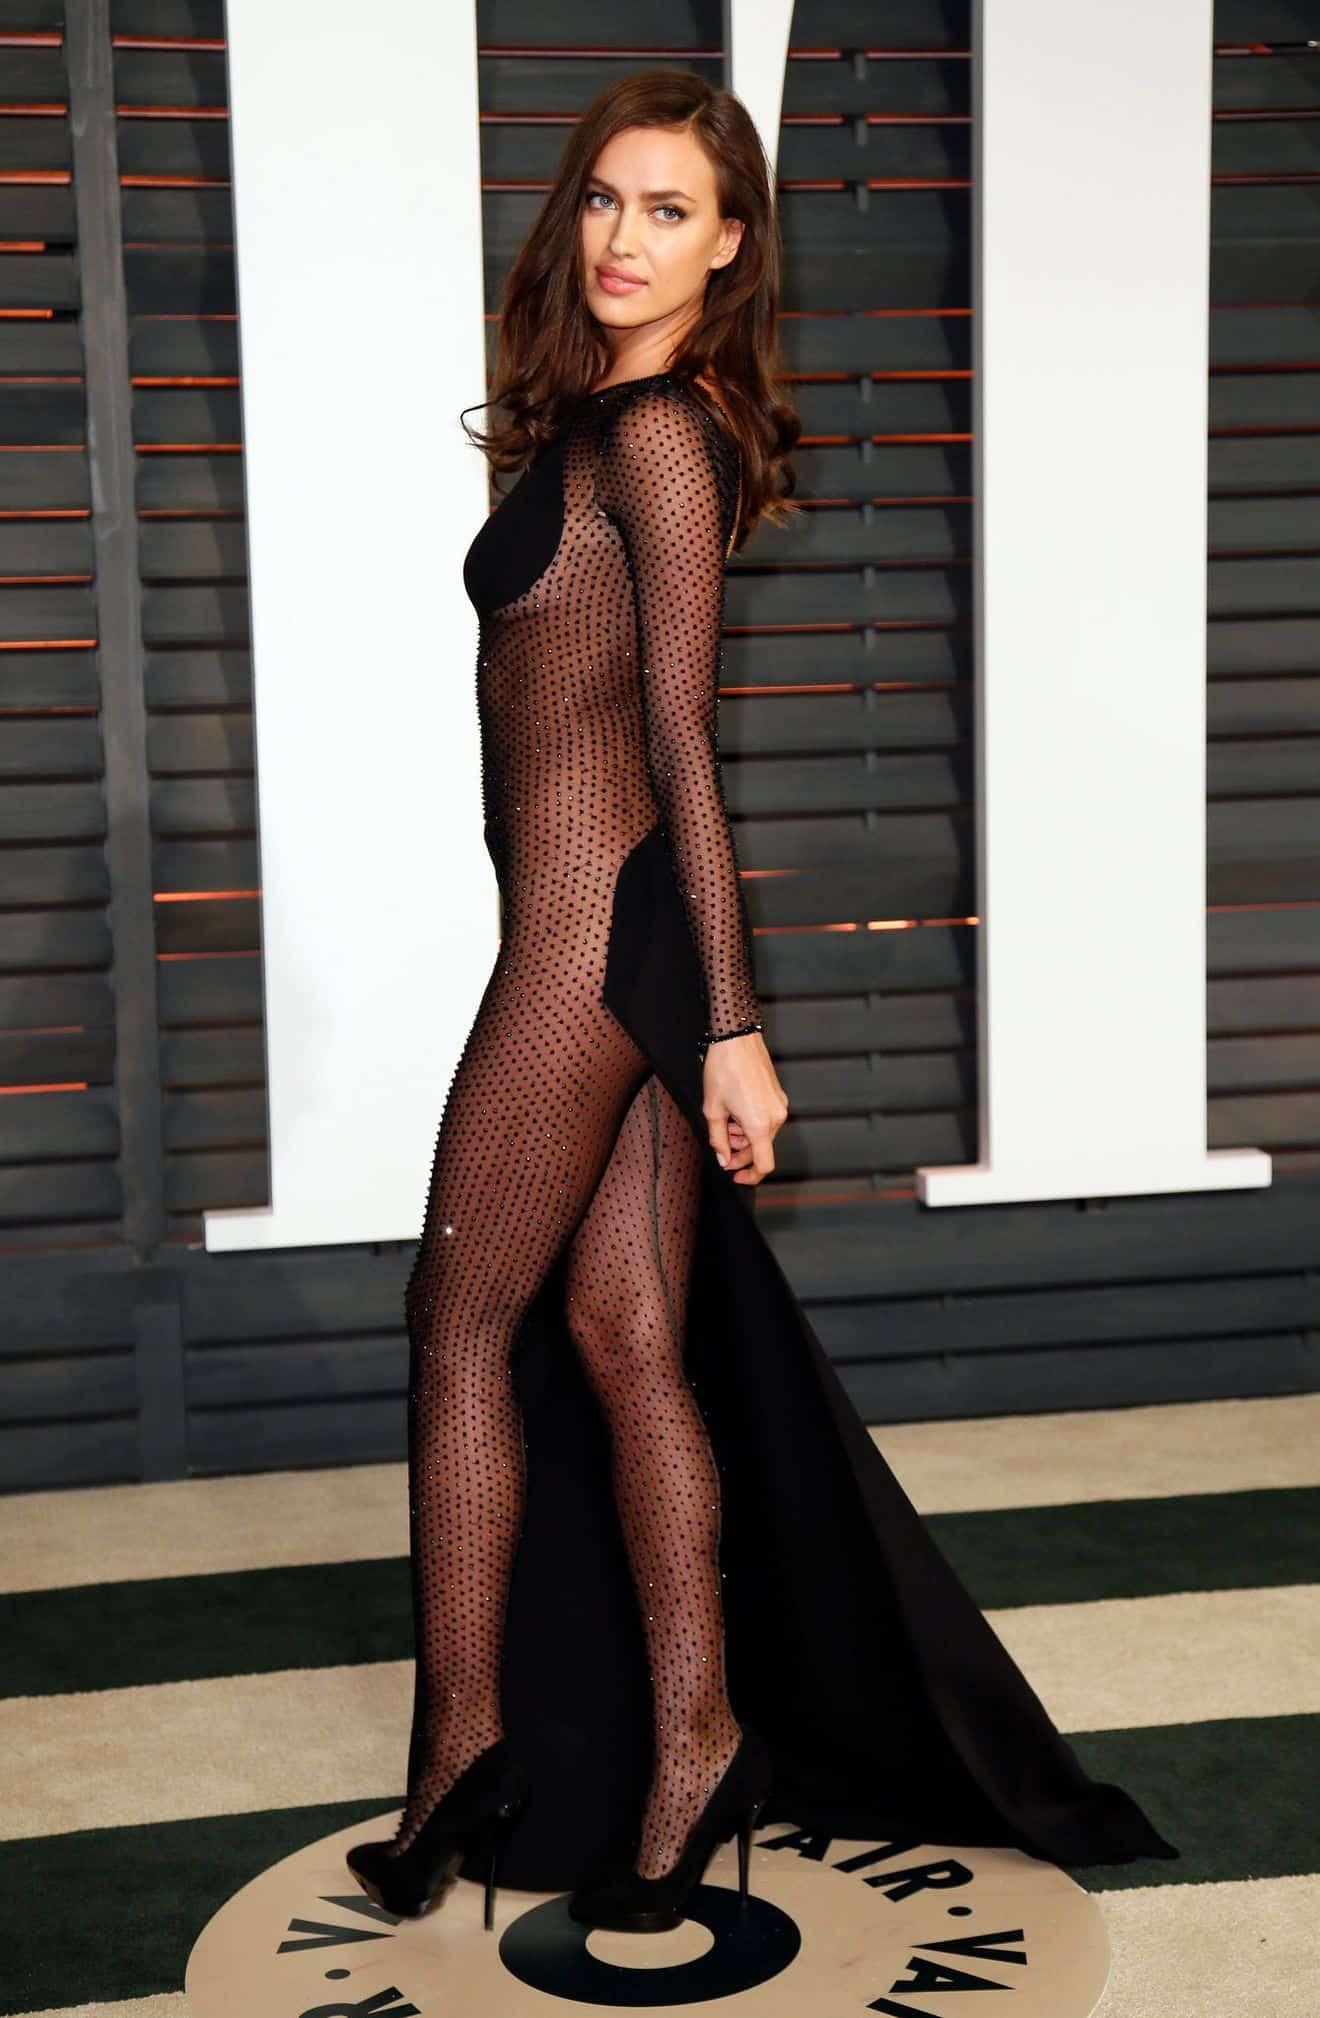 Robe sexy : la robe qui révèle vos charmes